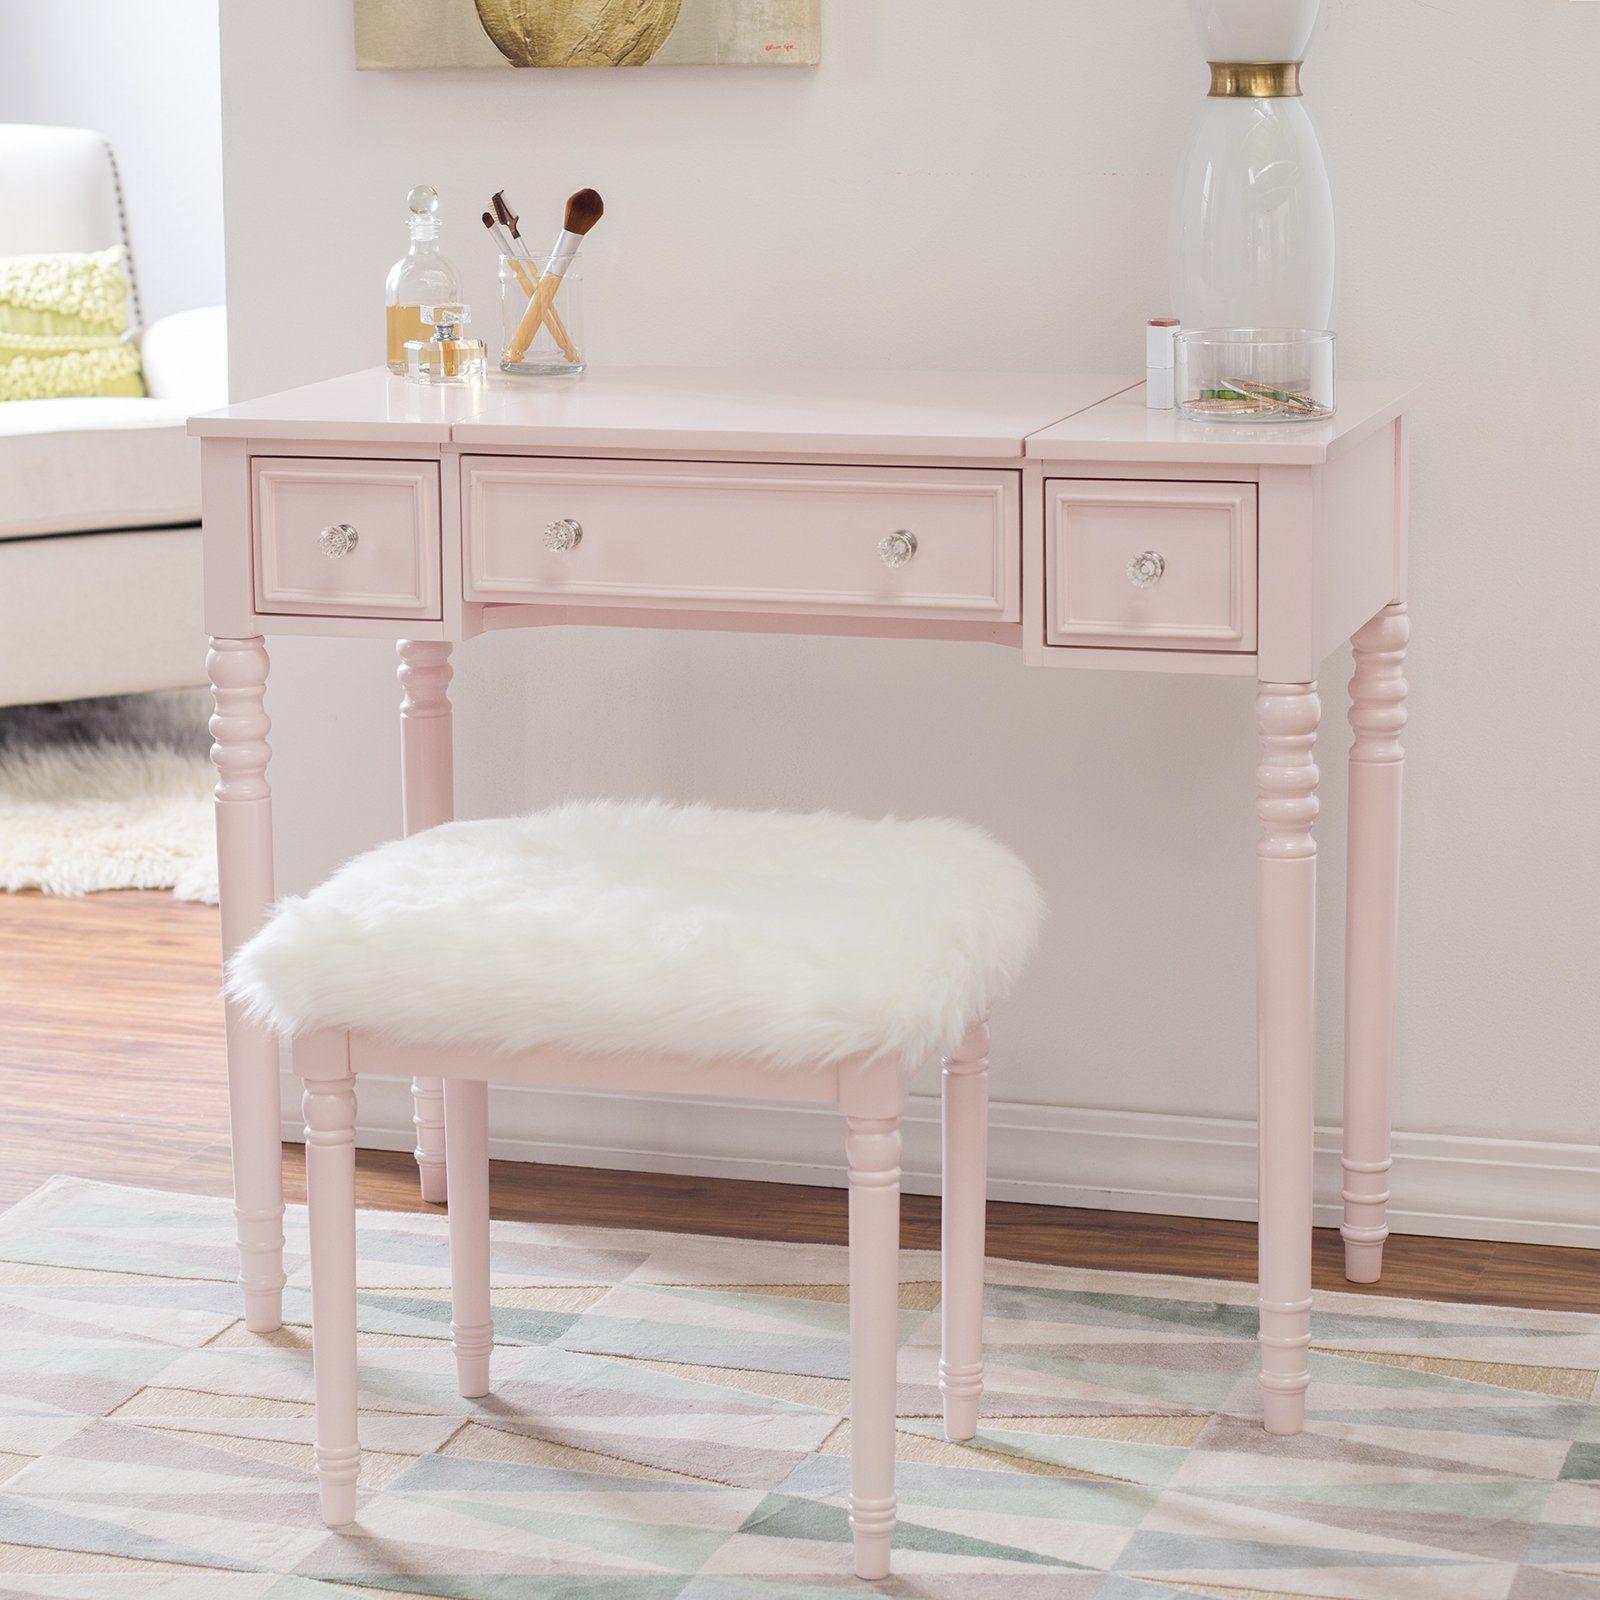 Linon Biltmore Vanity Set Blush from hayneedle